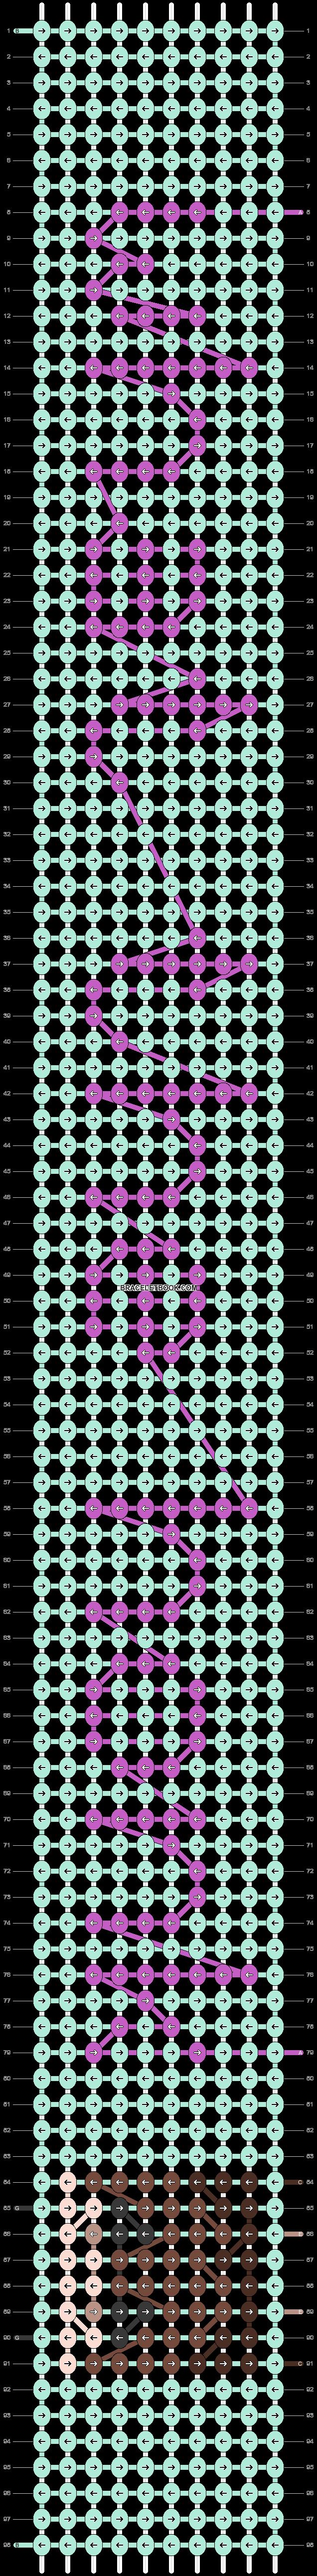 Alpha pattern #82388 pattern